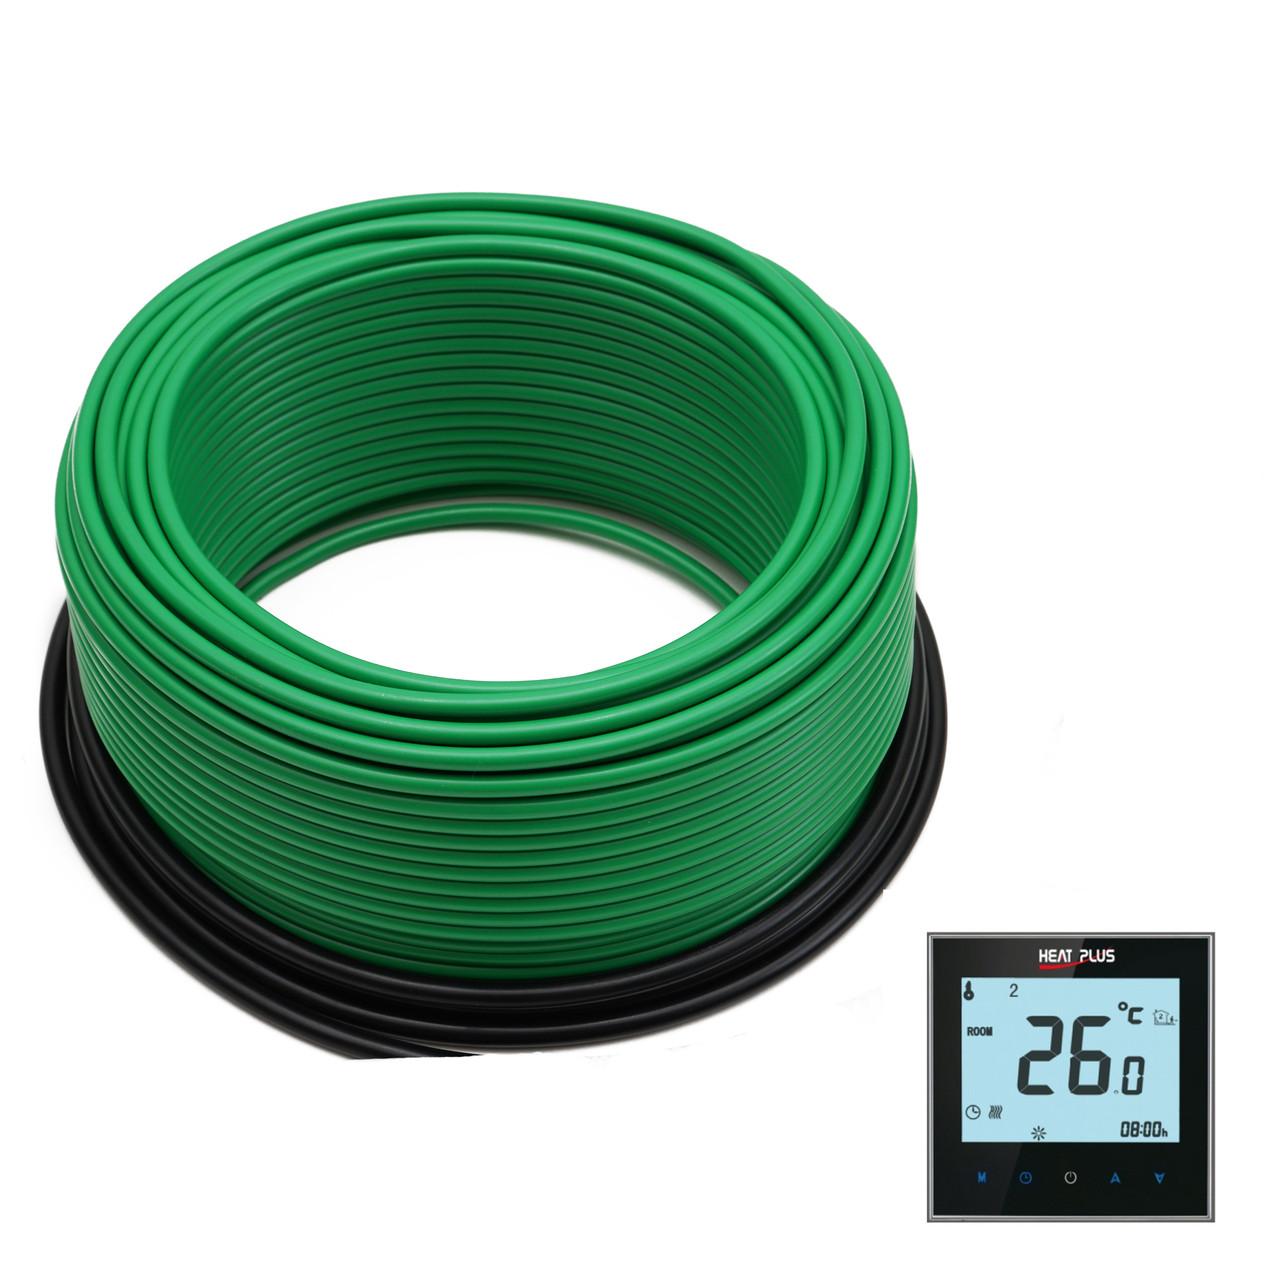 Комплект Нагревательный кабель ThermoGreen CT20-300W 155м2 + Терморегулятор ITEO 4